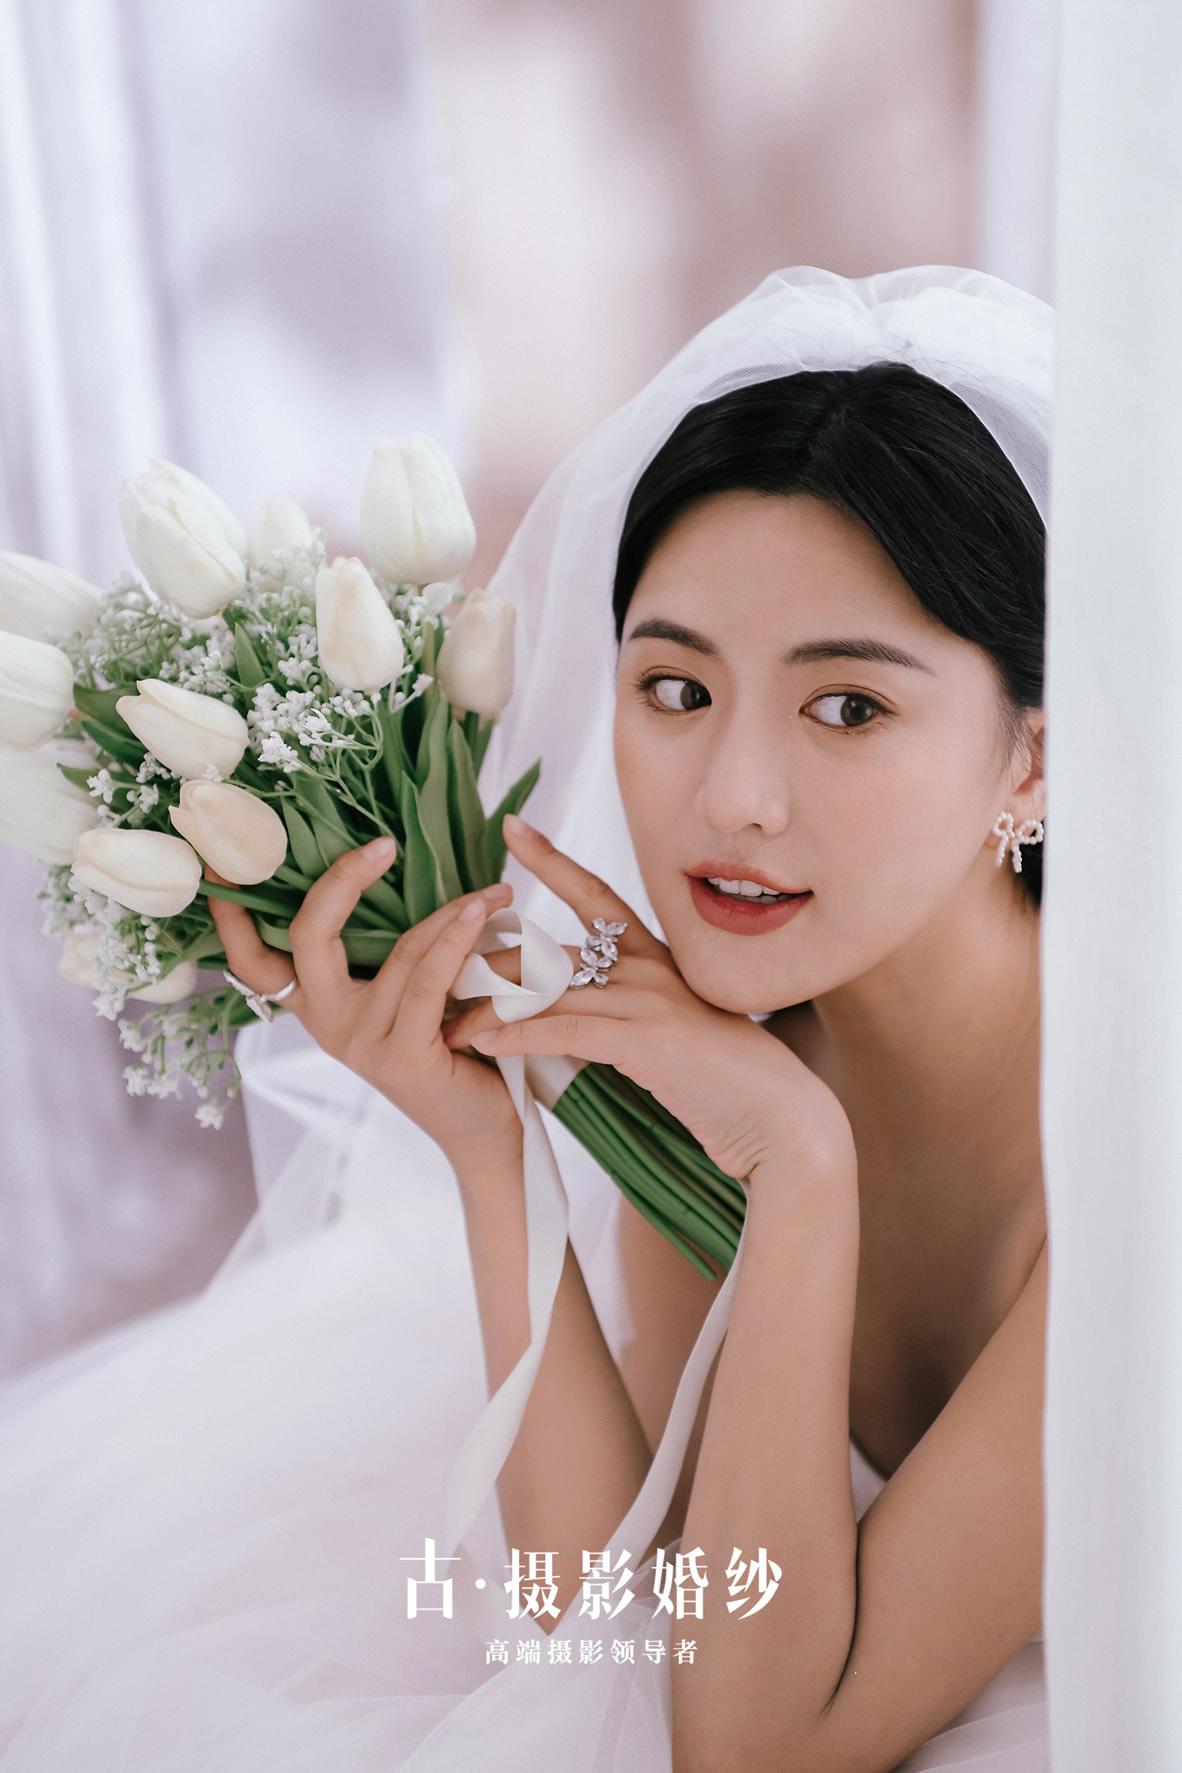 LE SOLEI - 明星范 - 古摄影婚纱艺术-古摄影成都婚纱摄影艺术摄影网